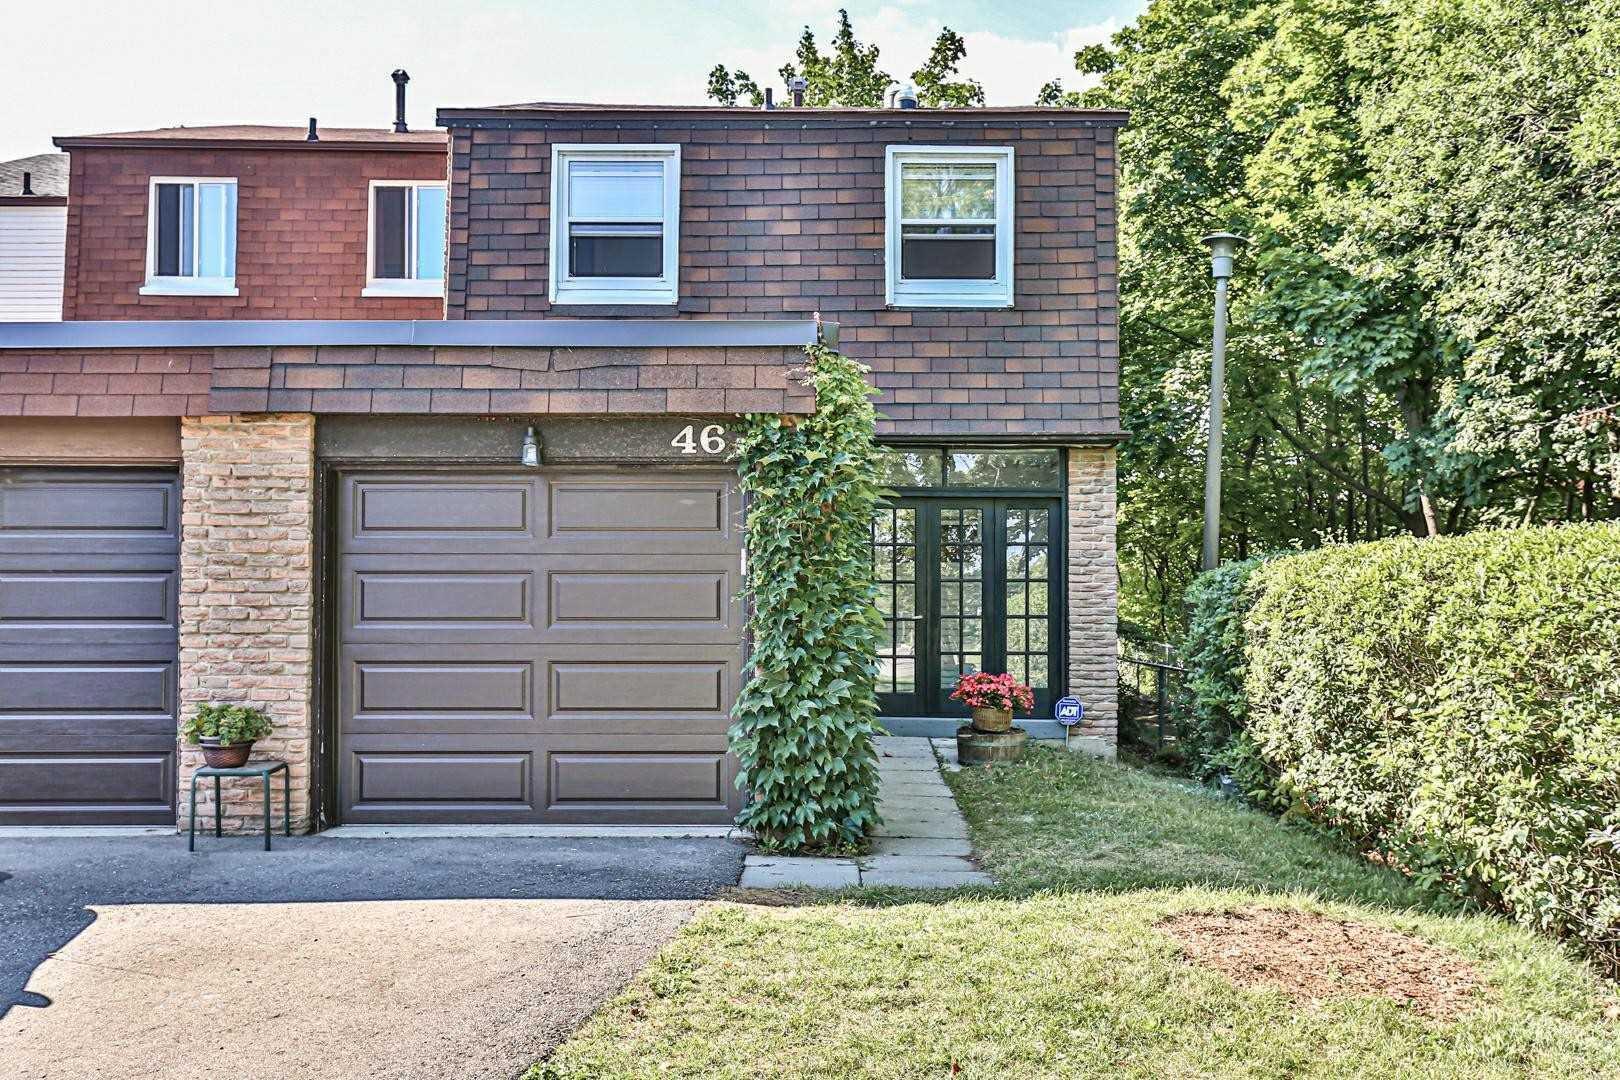 Main Photo: 46 L'amoreaux Drive in Toronto: L'Amoreaux House (2-Storey) for sale (Toronto E05)  : MLS®# E4861230